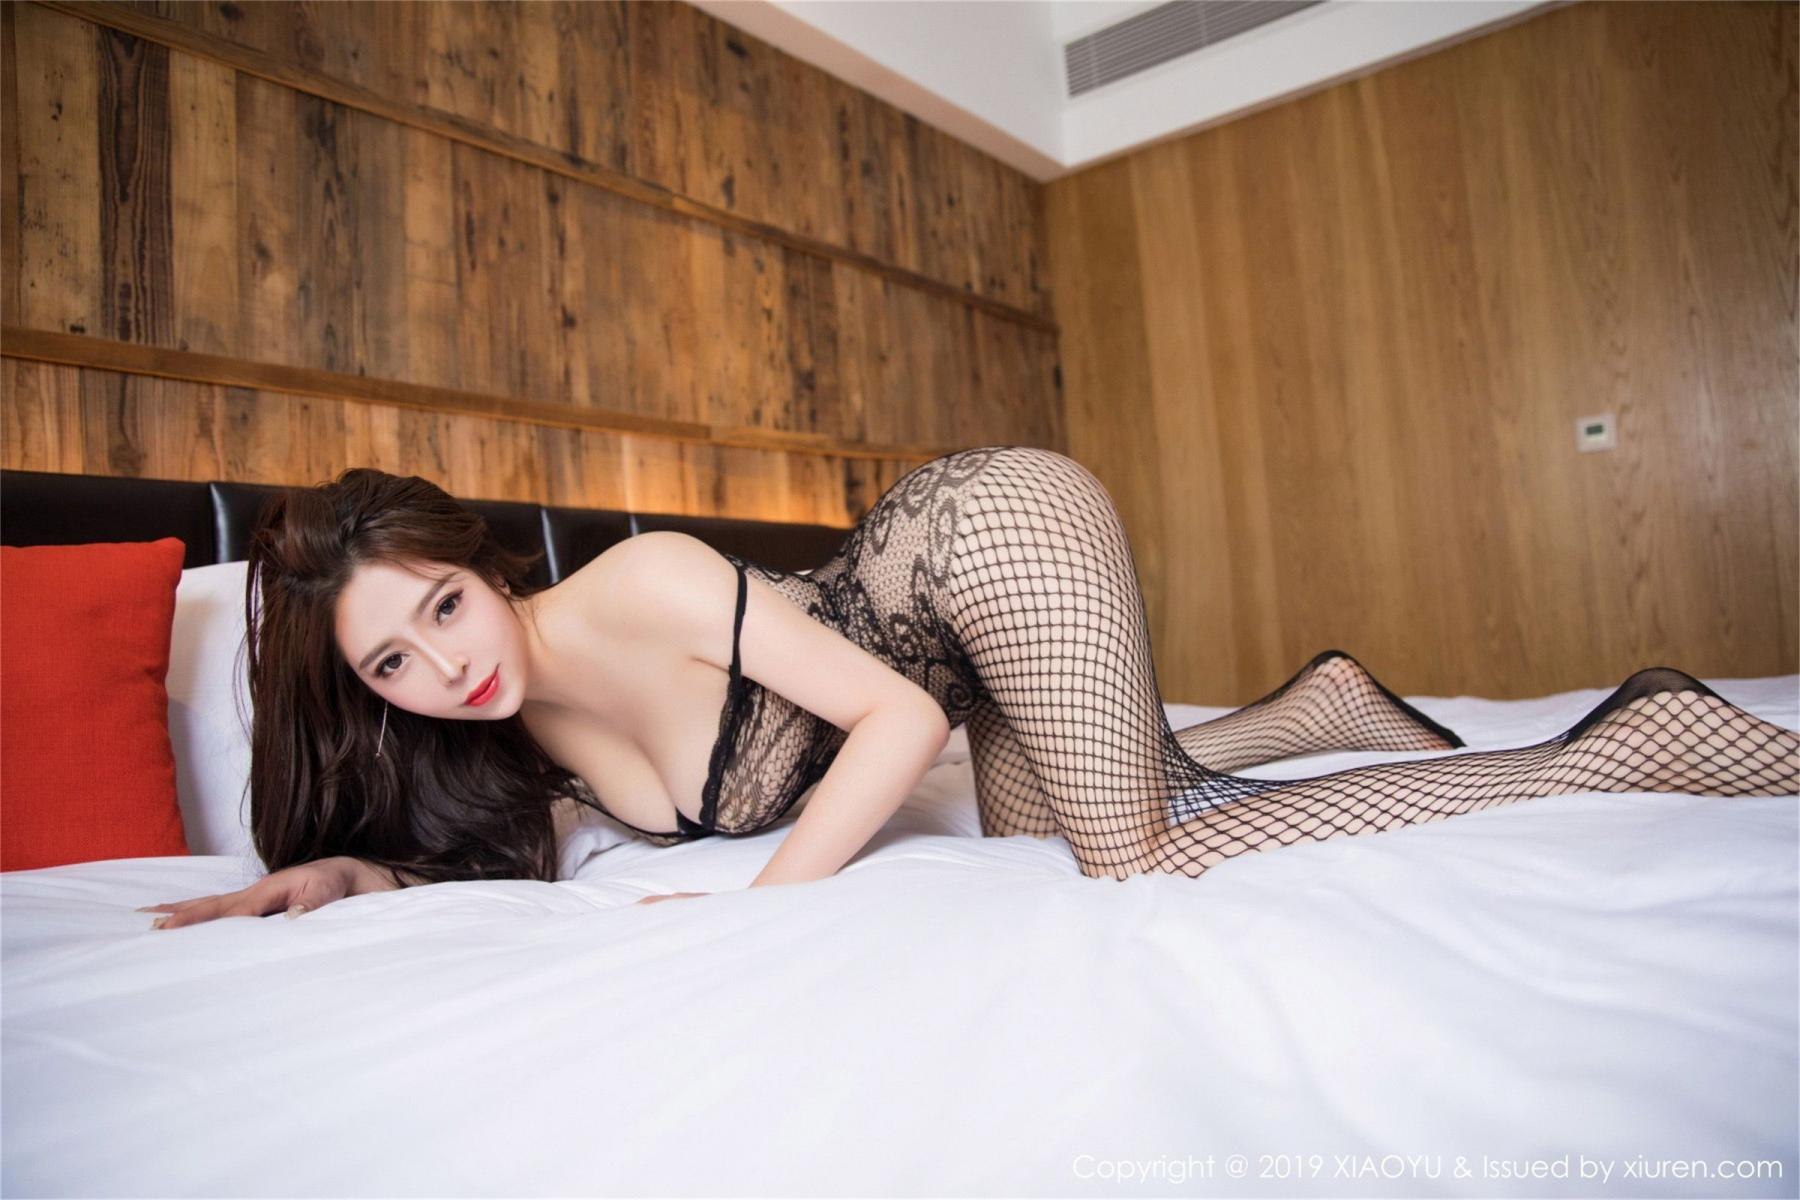 [XiaoYu] Vol.058 Miki Tu 37P, Miki Tu, XiaoYu